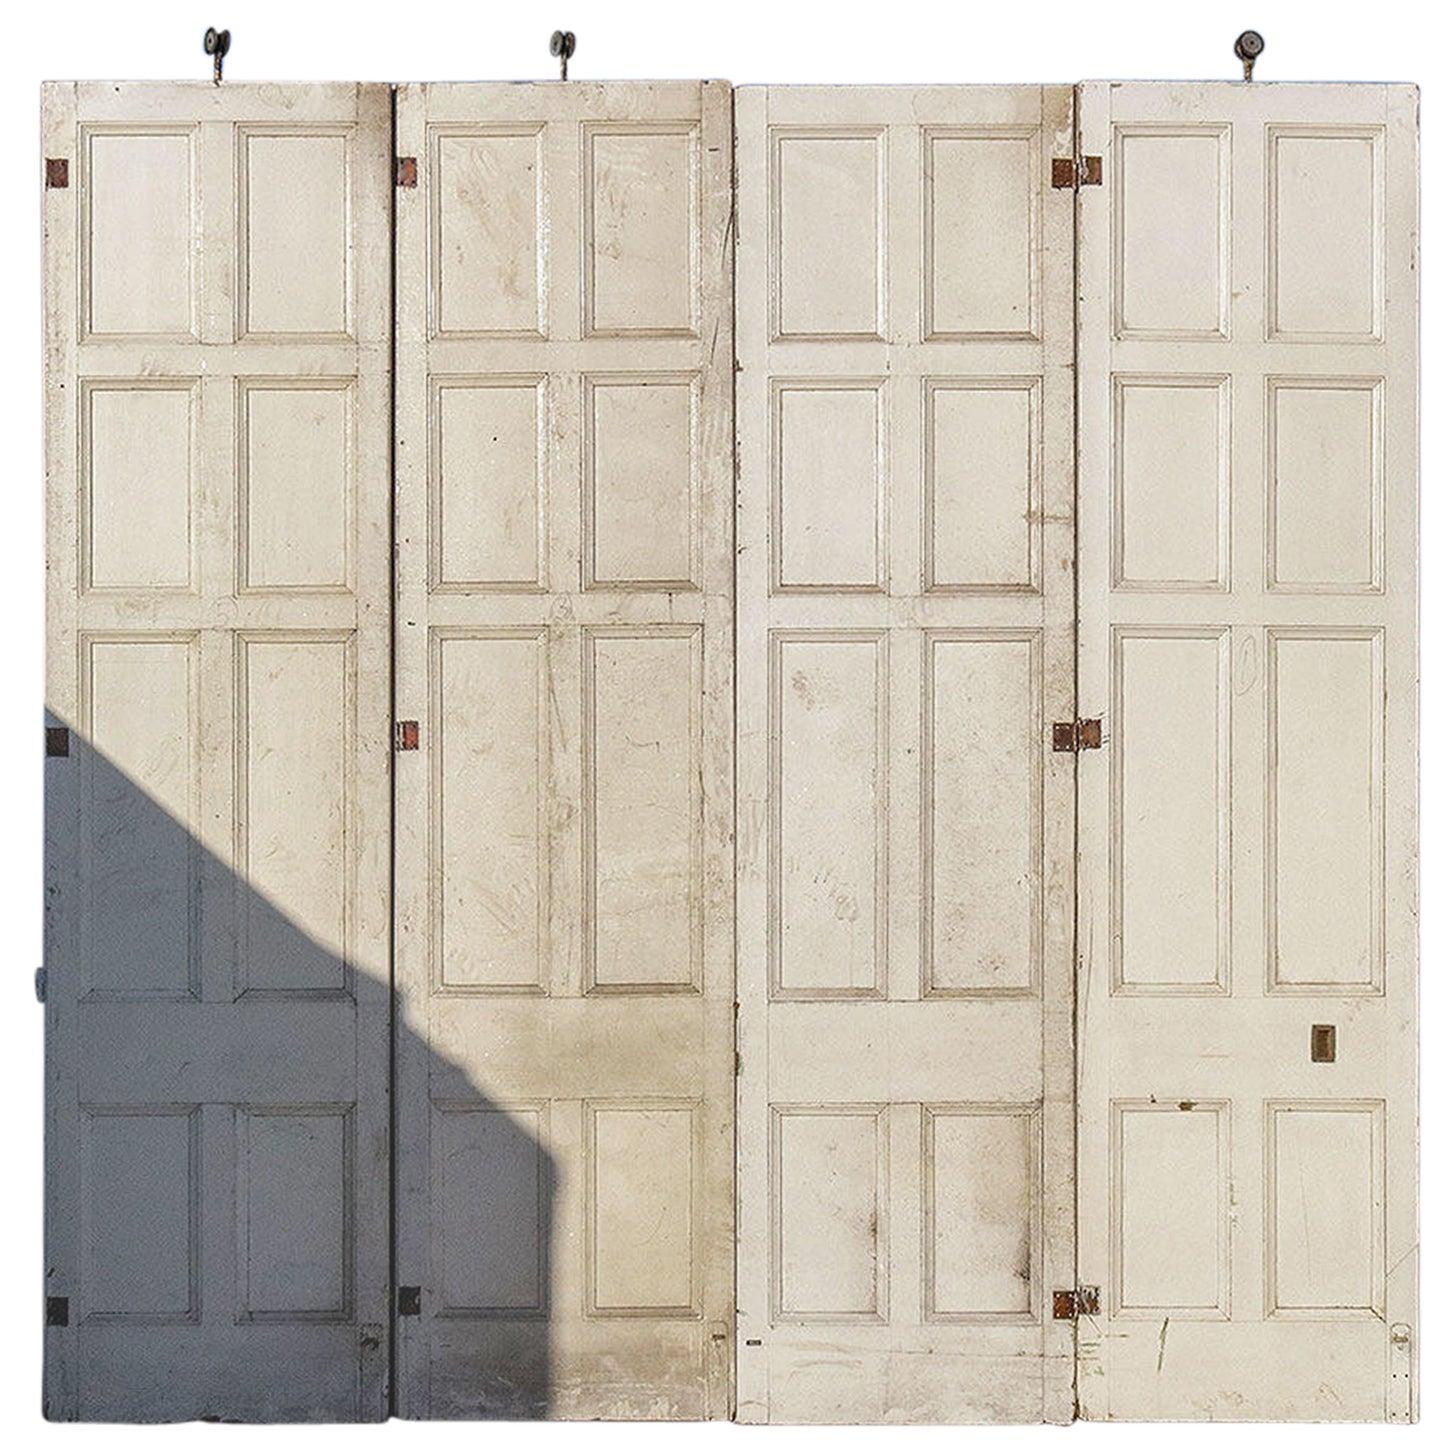 Job Lot of Four Large Sliding Door Panels, 20th Century